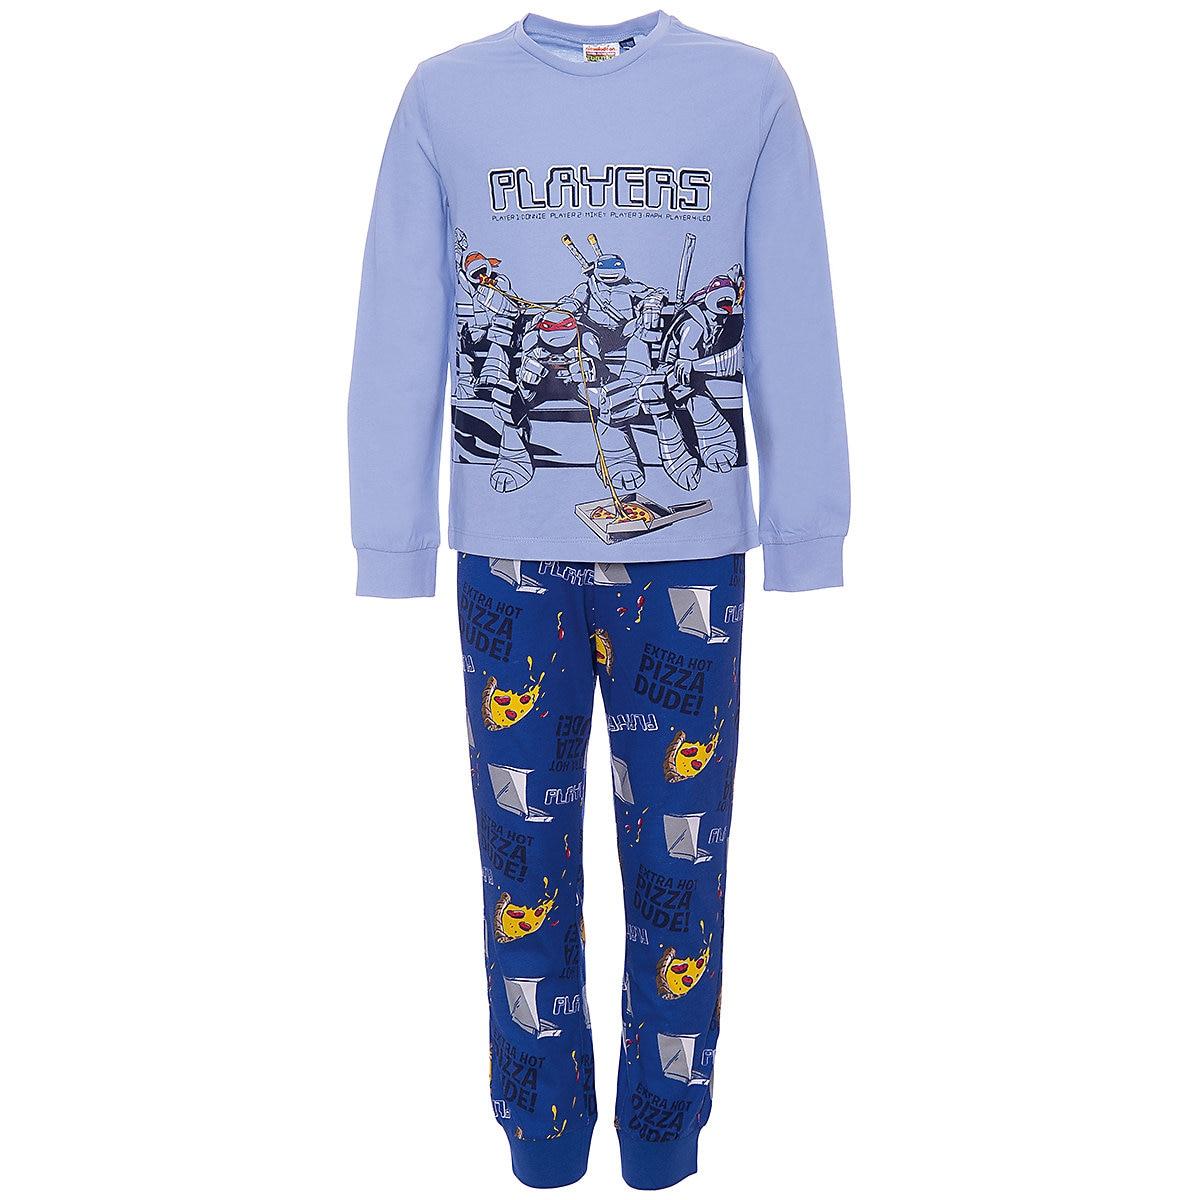 ORIGINAL MARINES Sleepwear & Robes 9502040 Cotton Baby Boys clothing pajamas wu nong wudang tai chi clothing robes uniforms surplices men and women hanfu taijiquan clothing coat winter thick robe